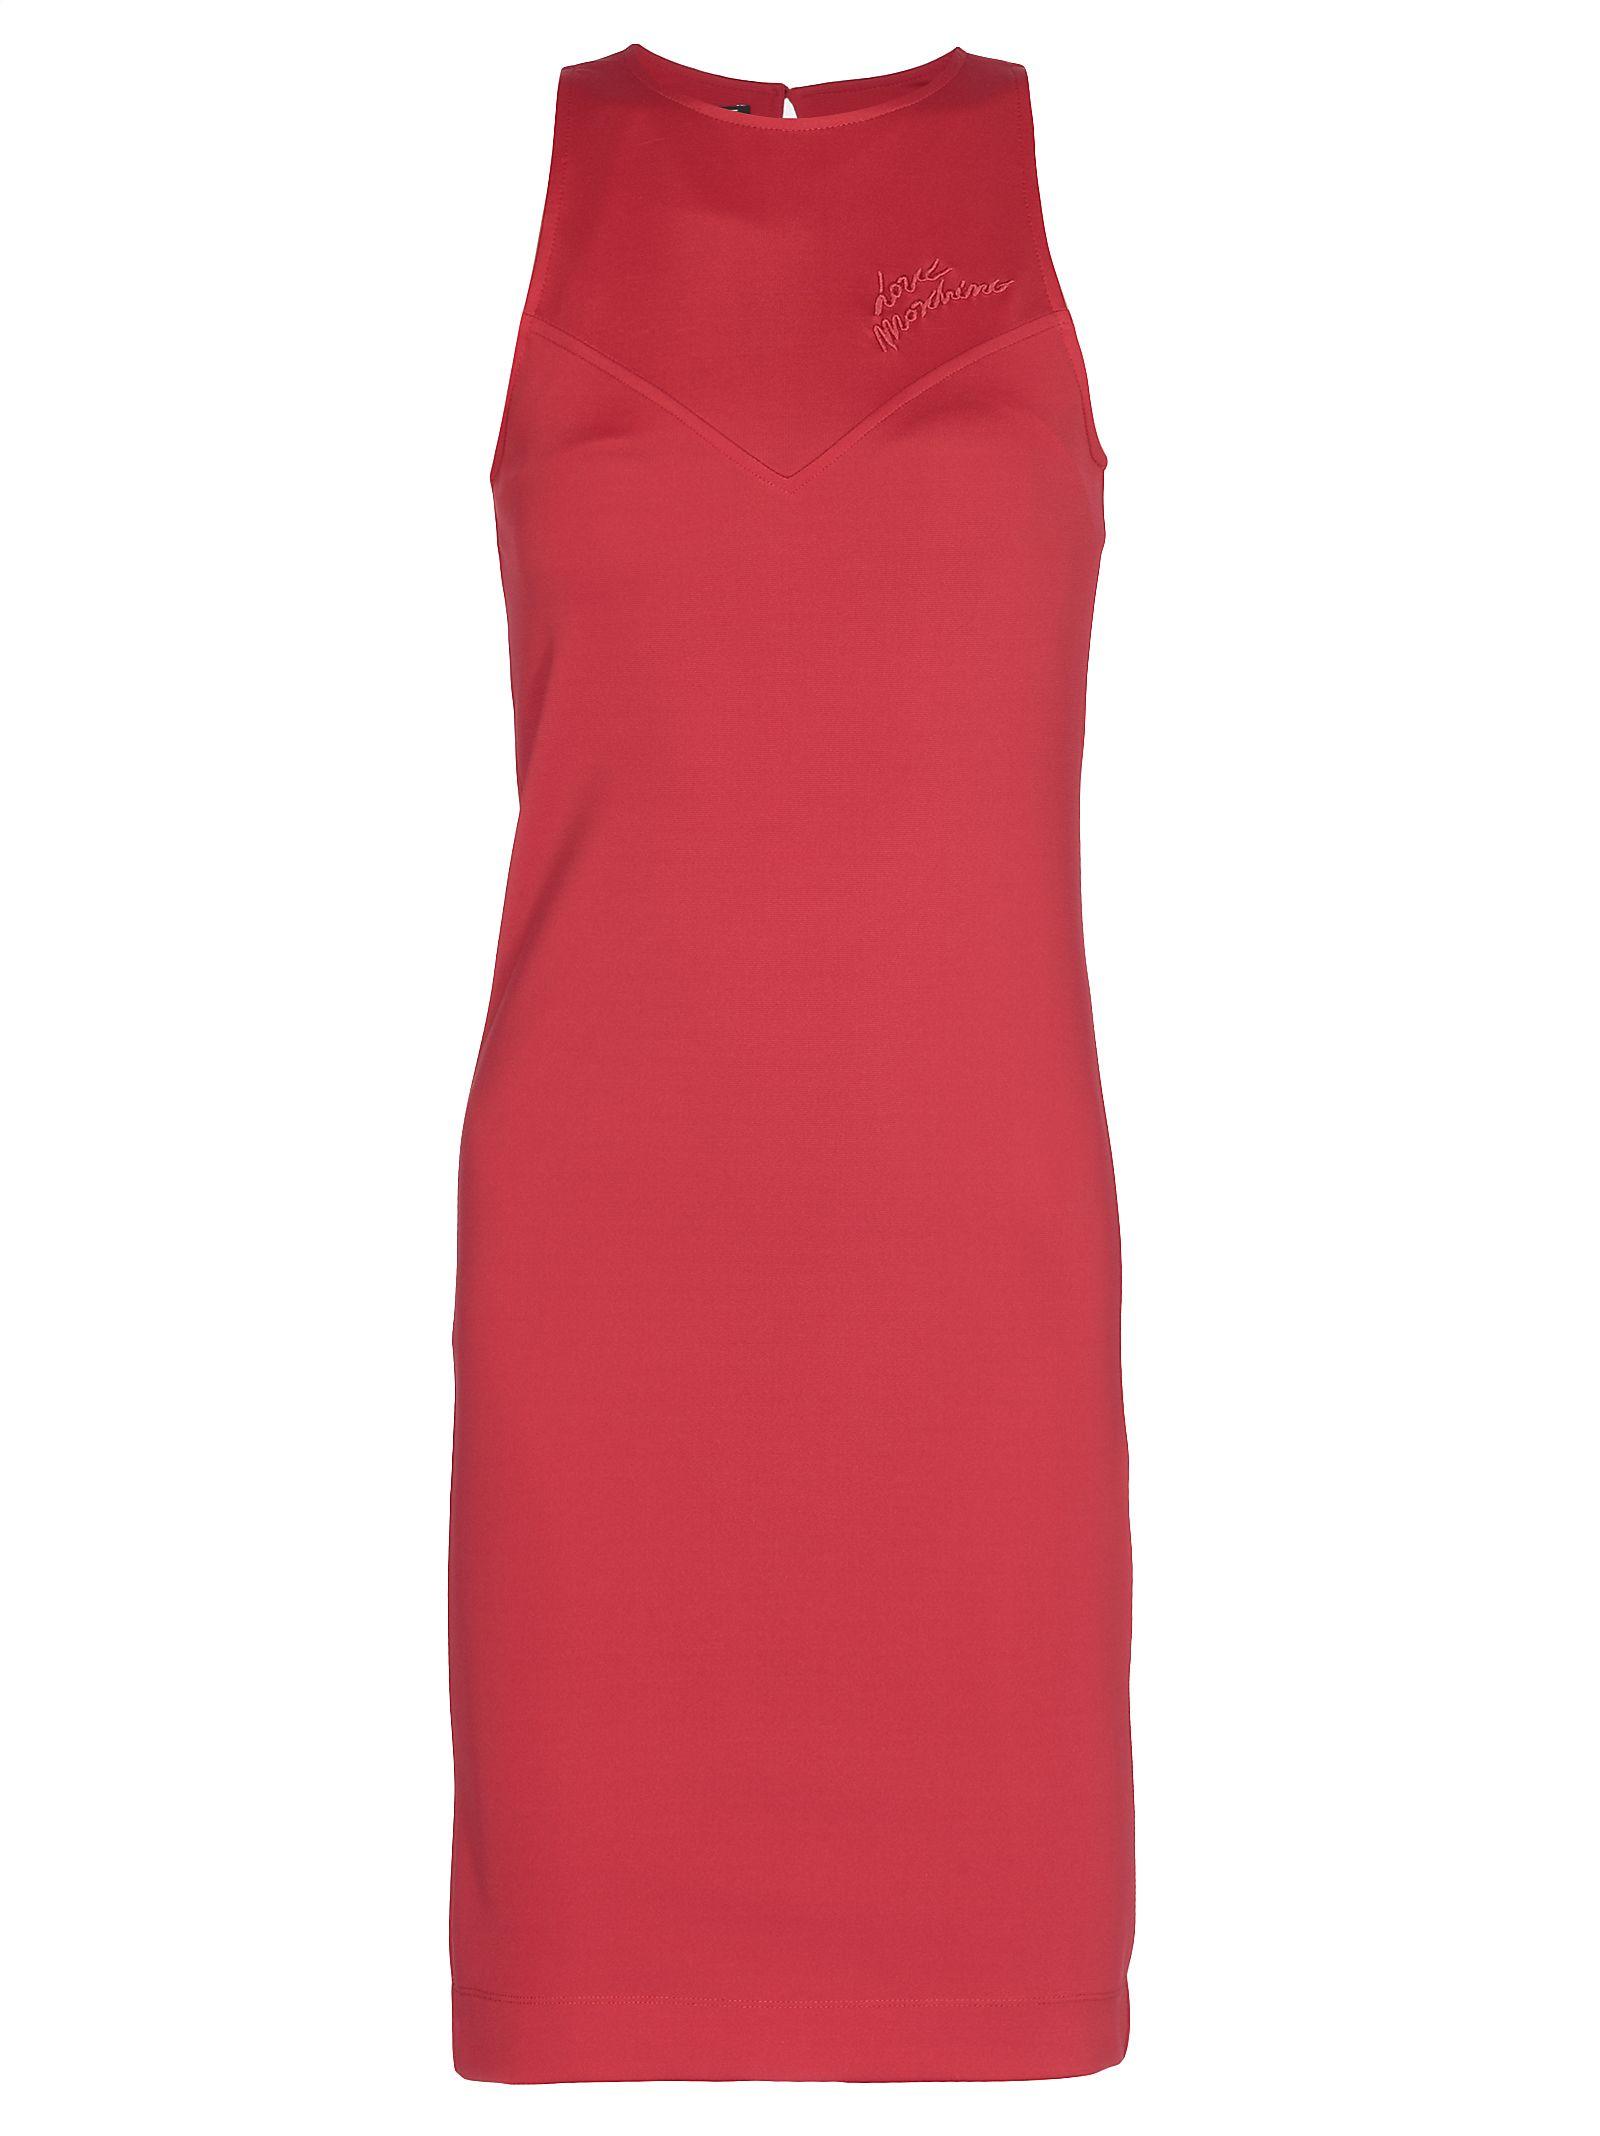 Love Moschino Love Moschino Plain Color Dress - RED - 10784768  b0dbdd51355